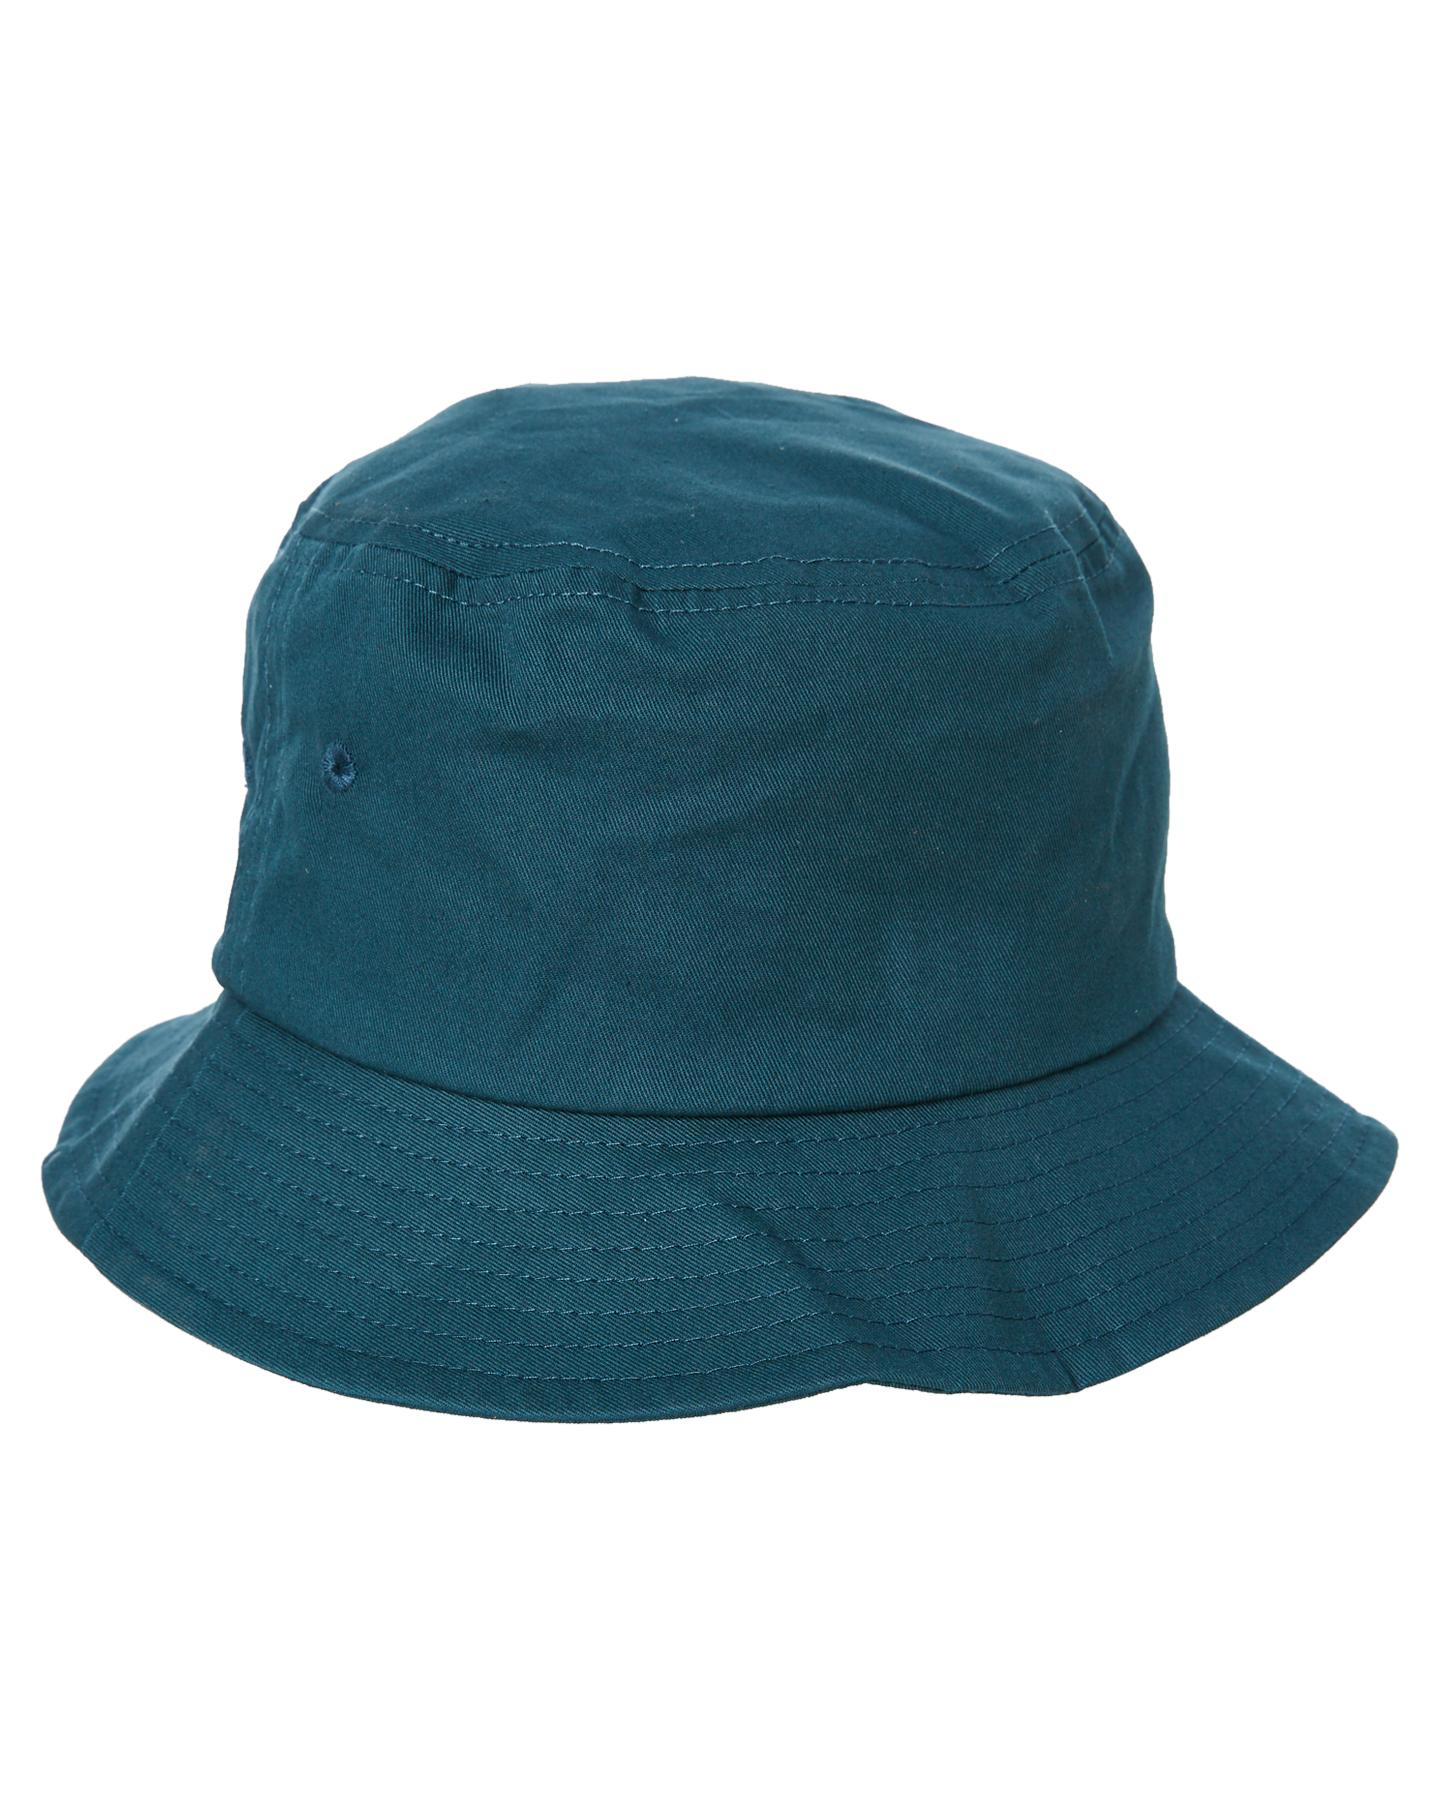 3054fc7b23b New Stussy Men s Stock Bucket Hat Cotton Soft Green